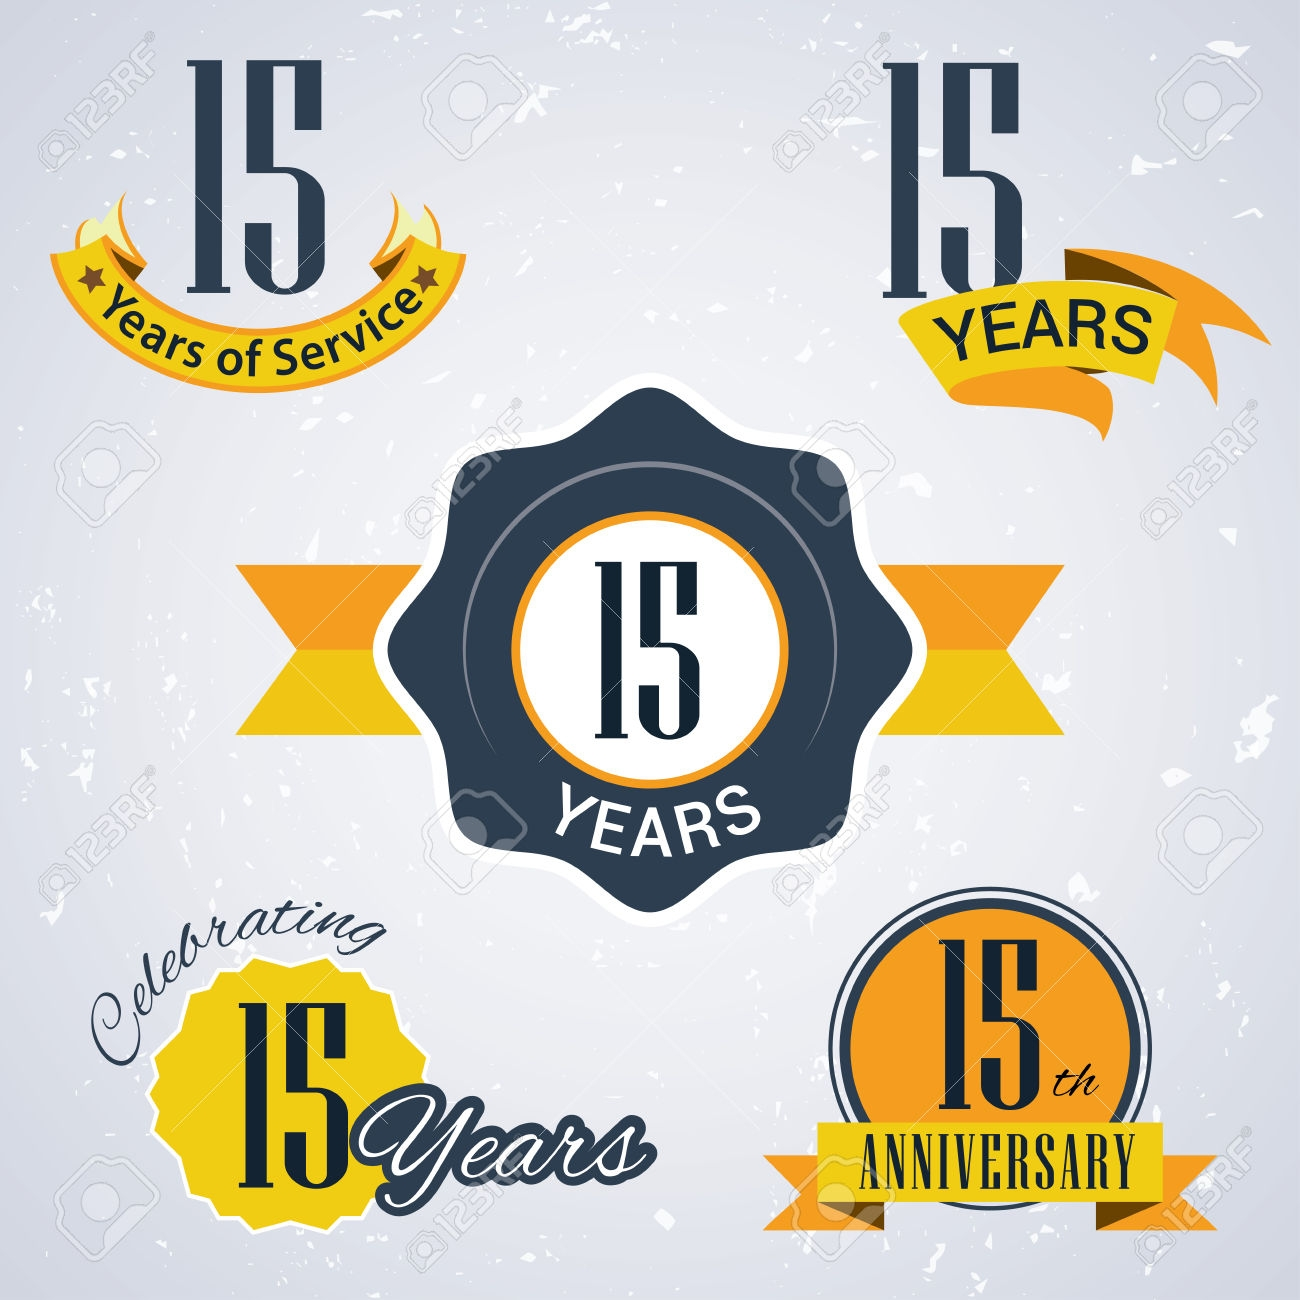 Free 15th Anniversary Cliparts, Download Free Clip Art, Free Clip.